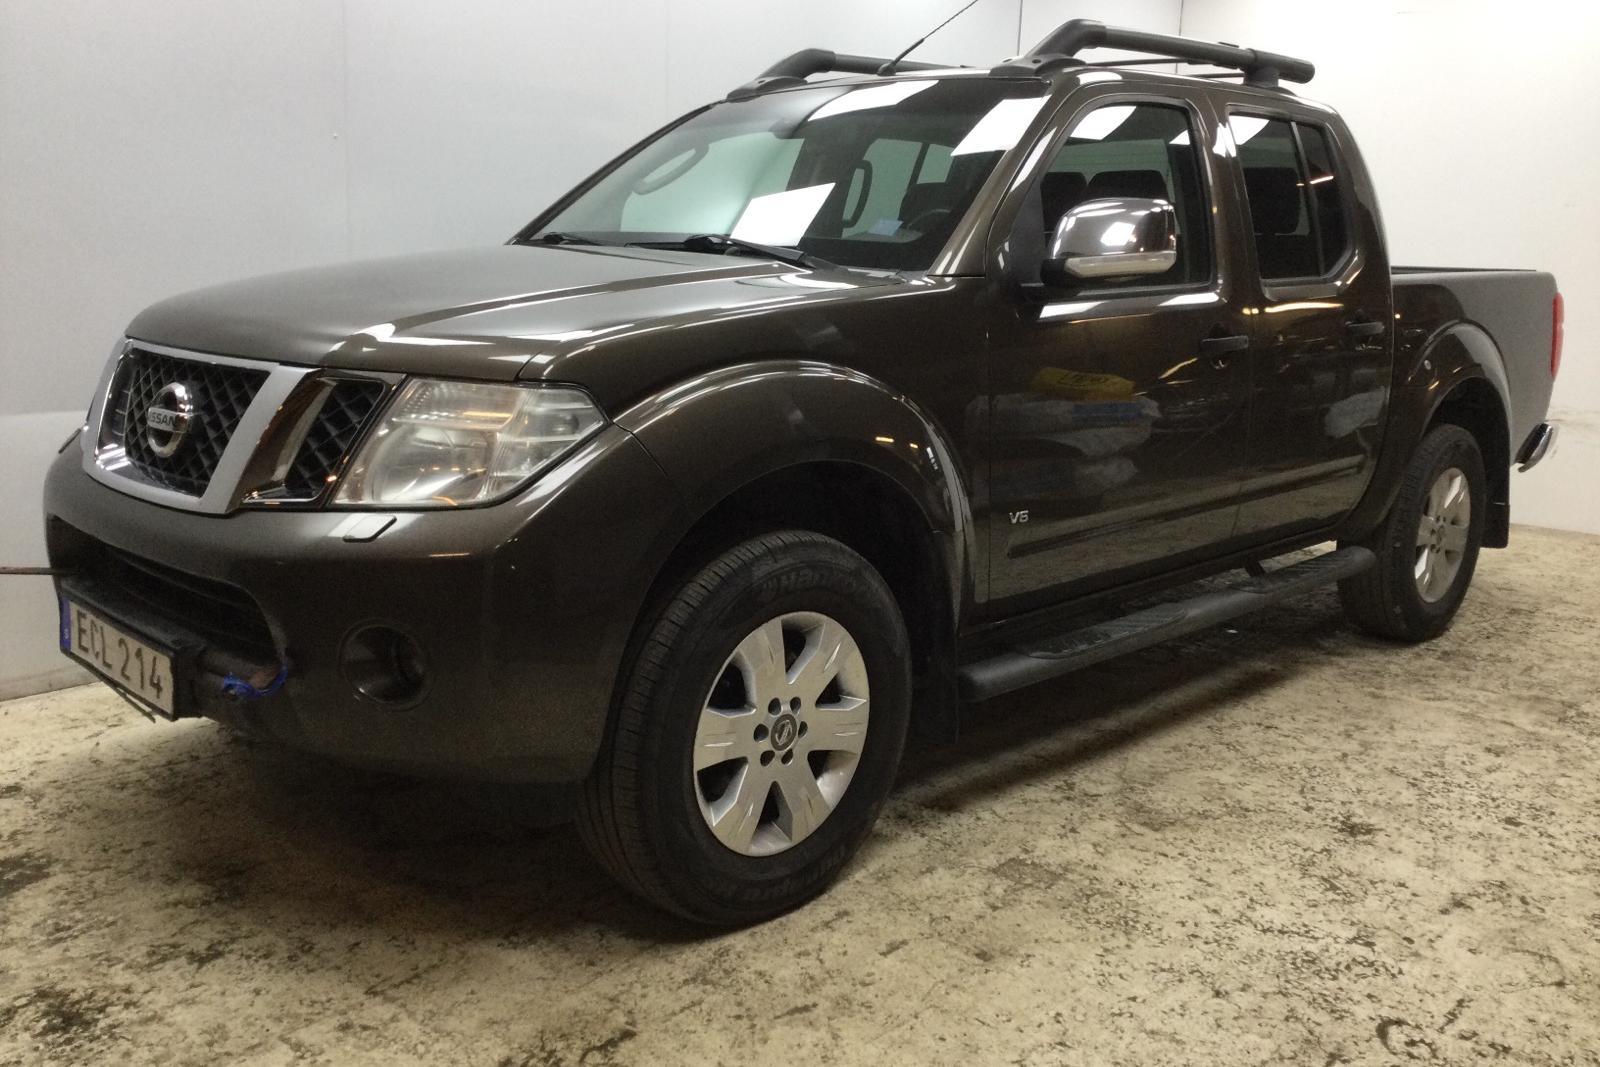 Nissan Navara 3.0 dCi V6 (231hk) - 163 160 km - Automatic - brown - 2015